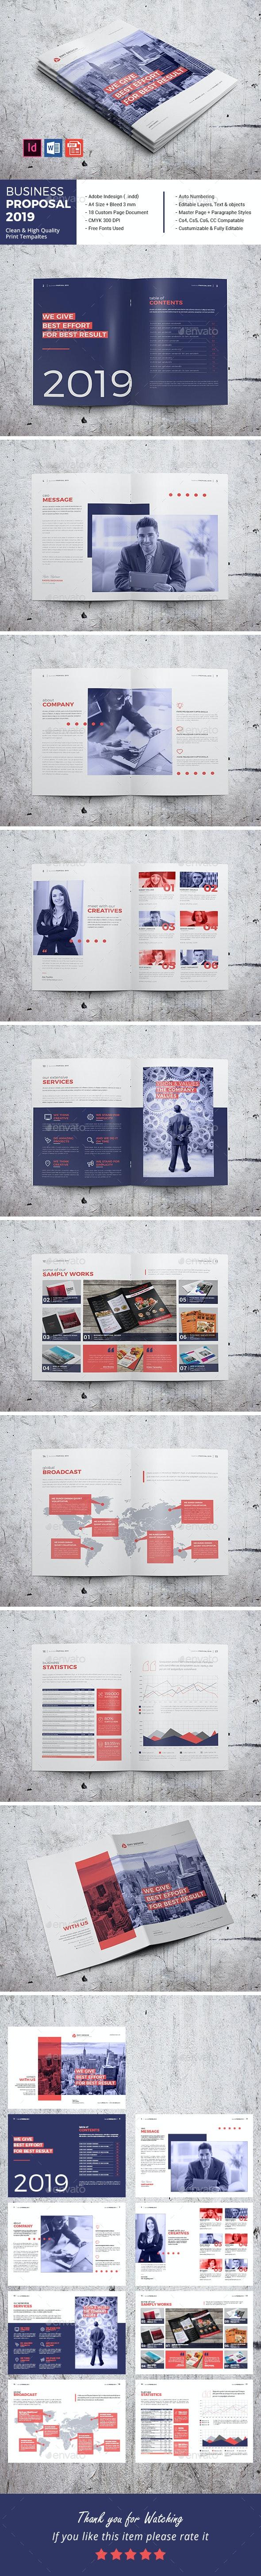 Business Proposal 2019 - Corporate Brochures